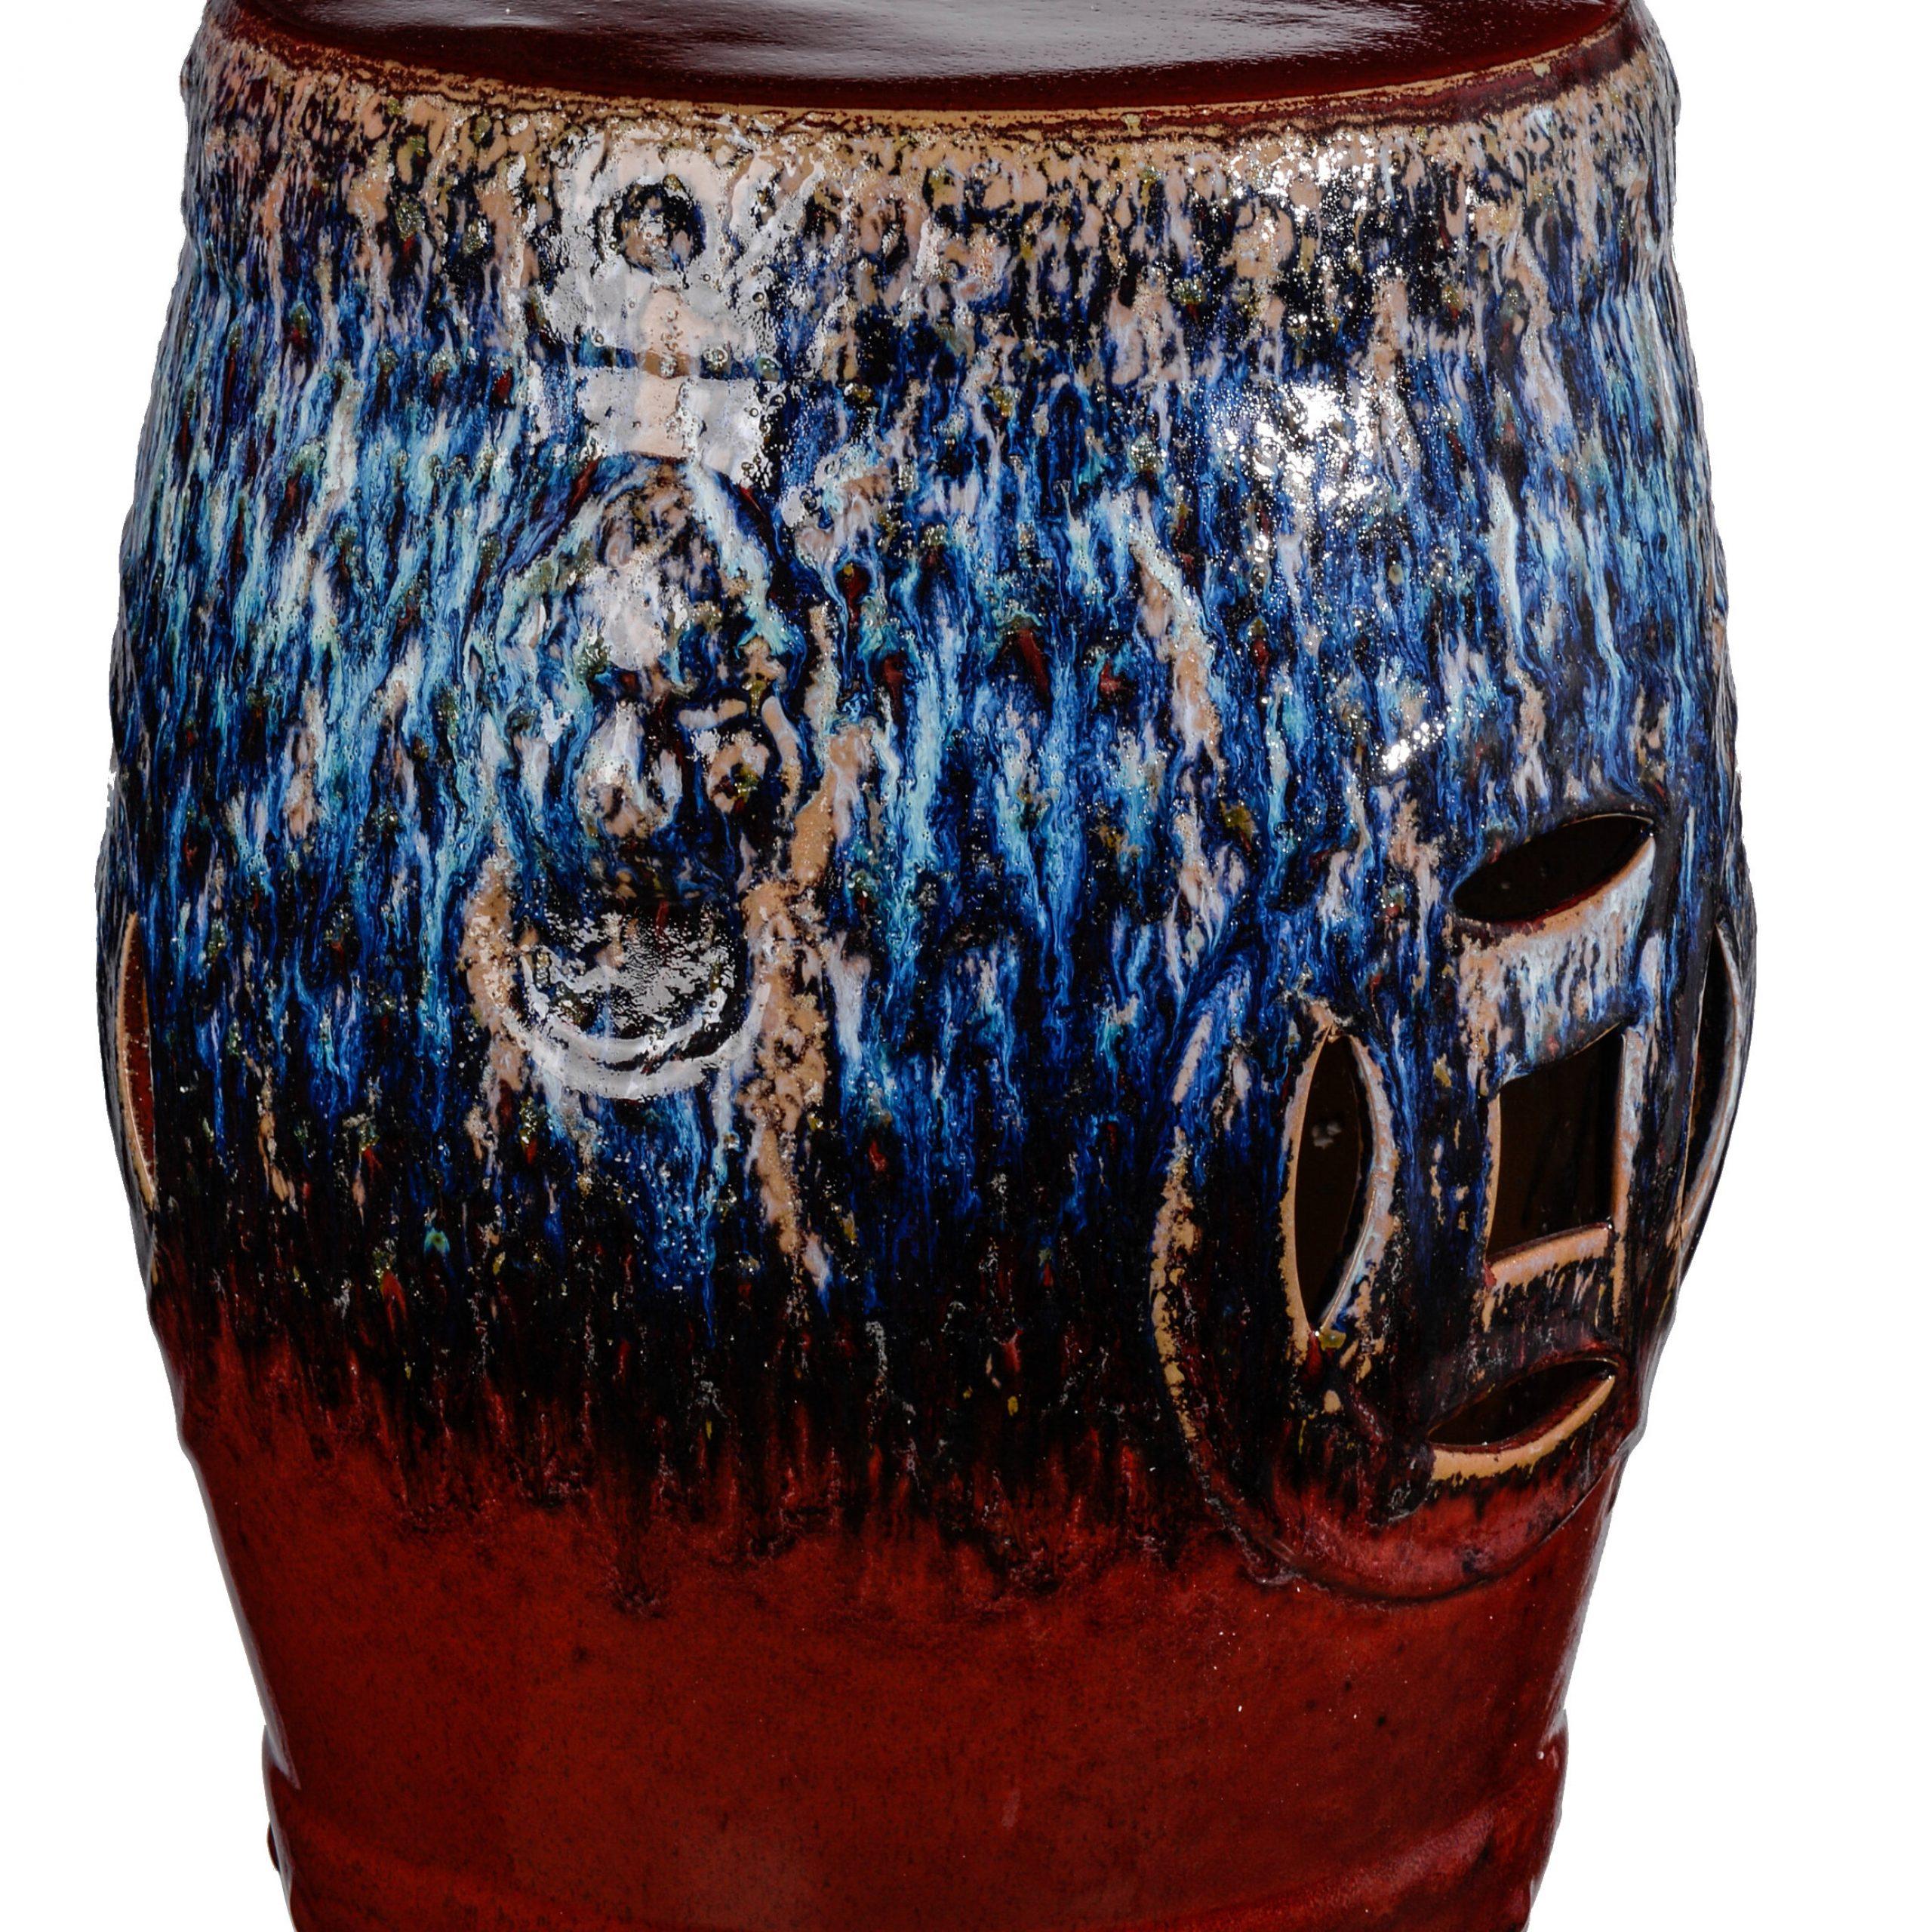 Newest Wilde Poppies Ceramic Garden Stools For Cates Ceramic Garden Stool (View 8 of 30)